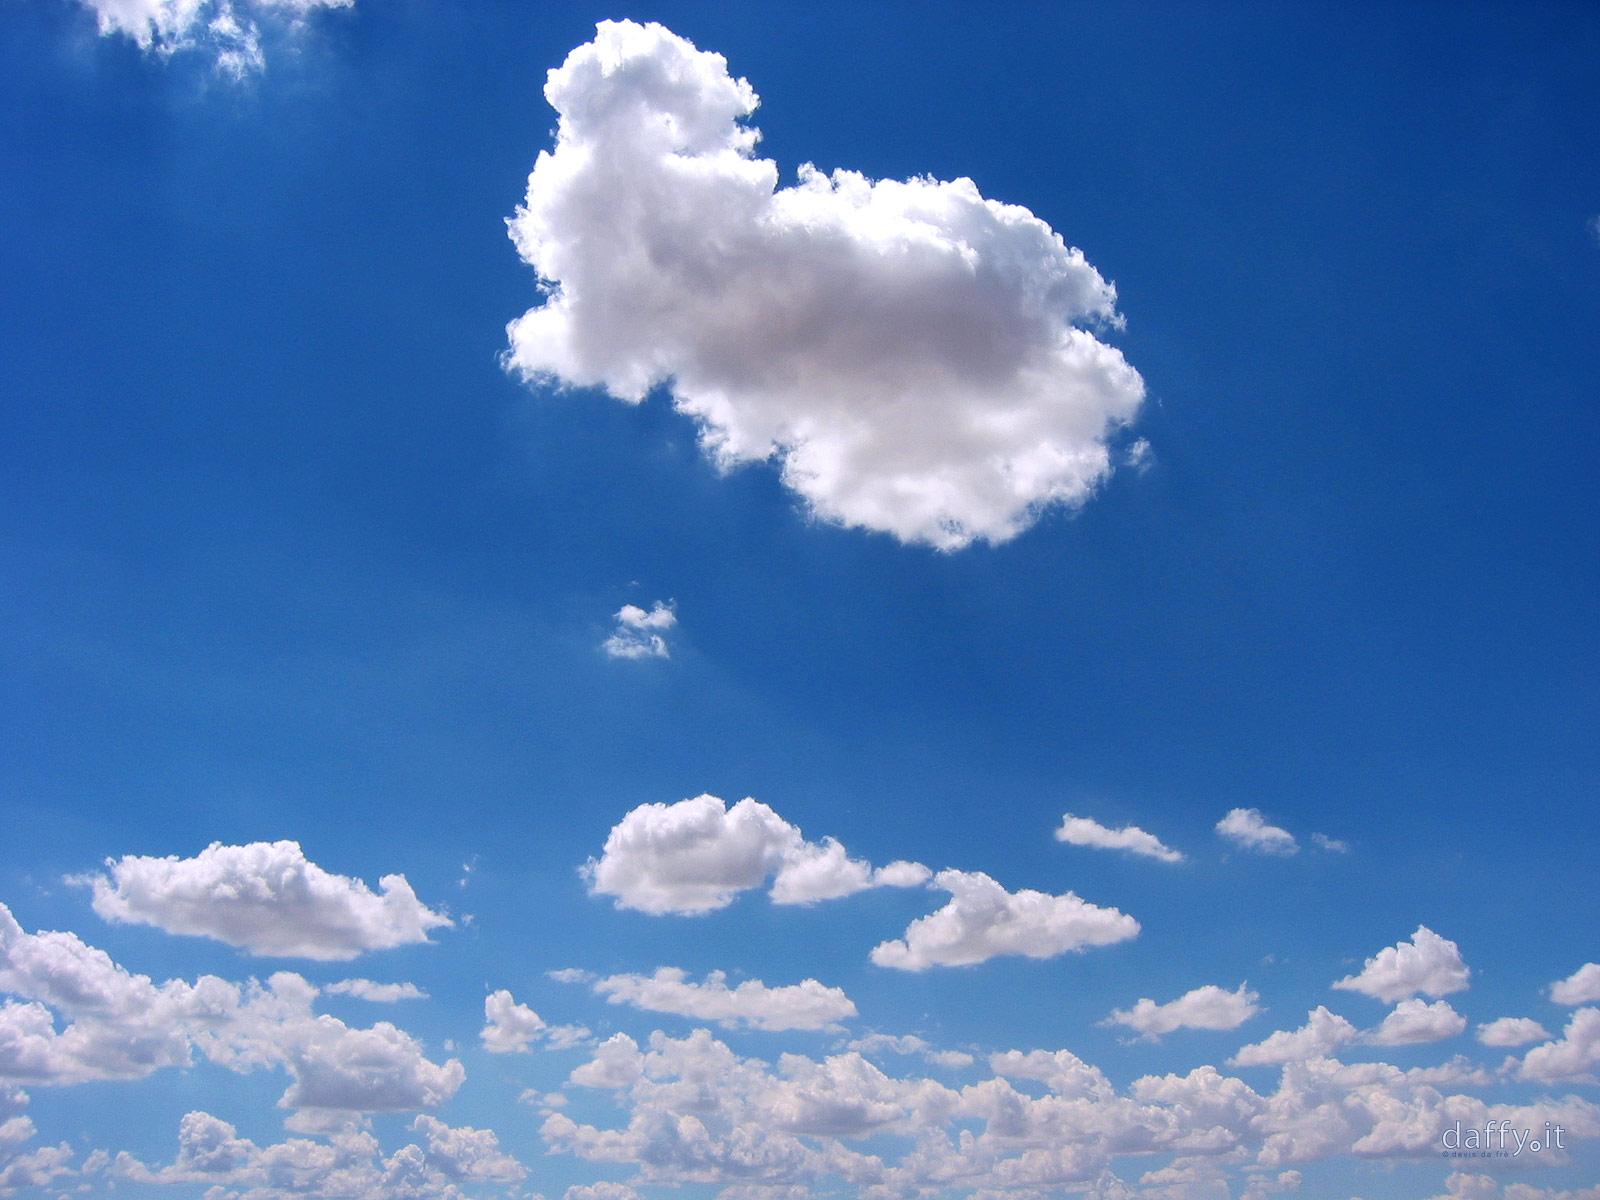 http://4.bp.blogspot.com/_KX1DEGPJiF8/TQUbevH8quI/AAAAAAAAAwk/5e4Wlt_zNxE/s1600/nuvole.jpg